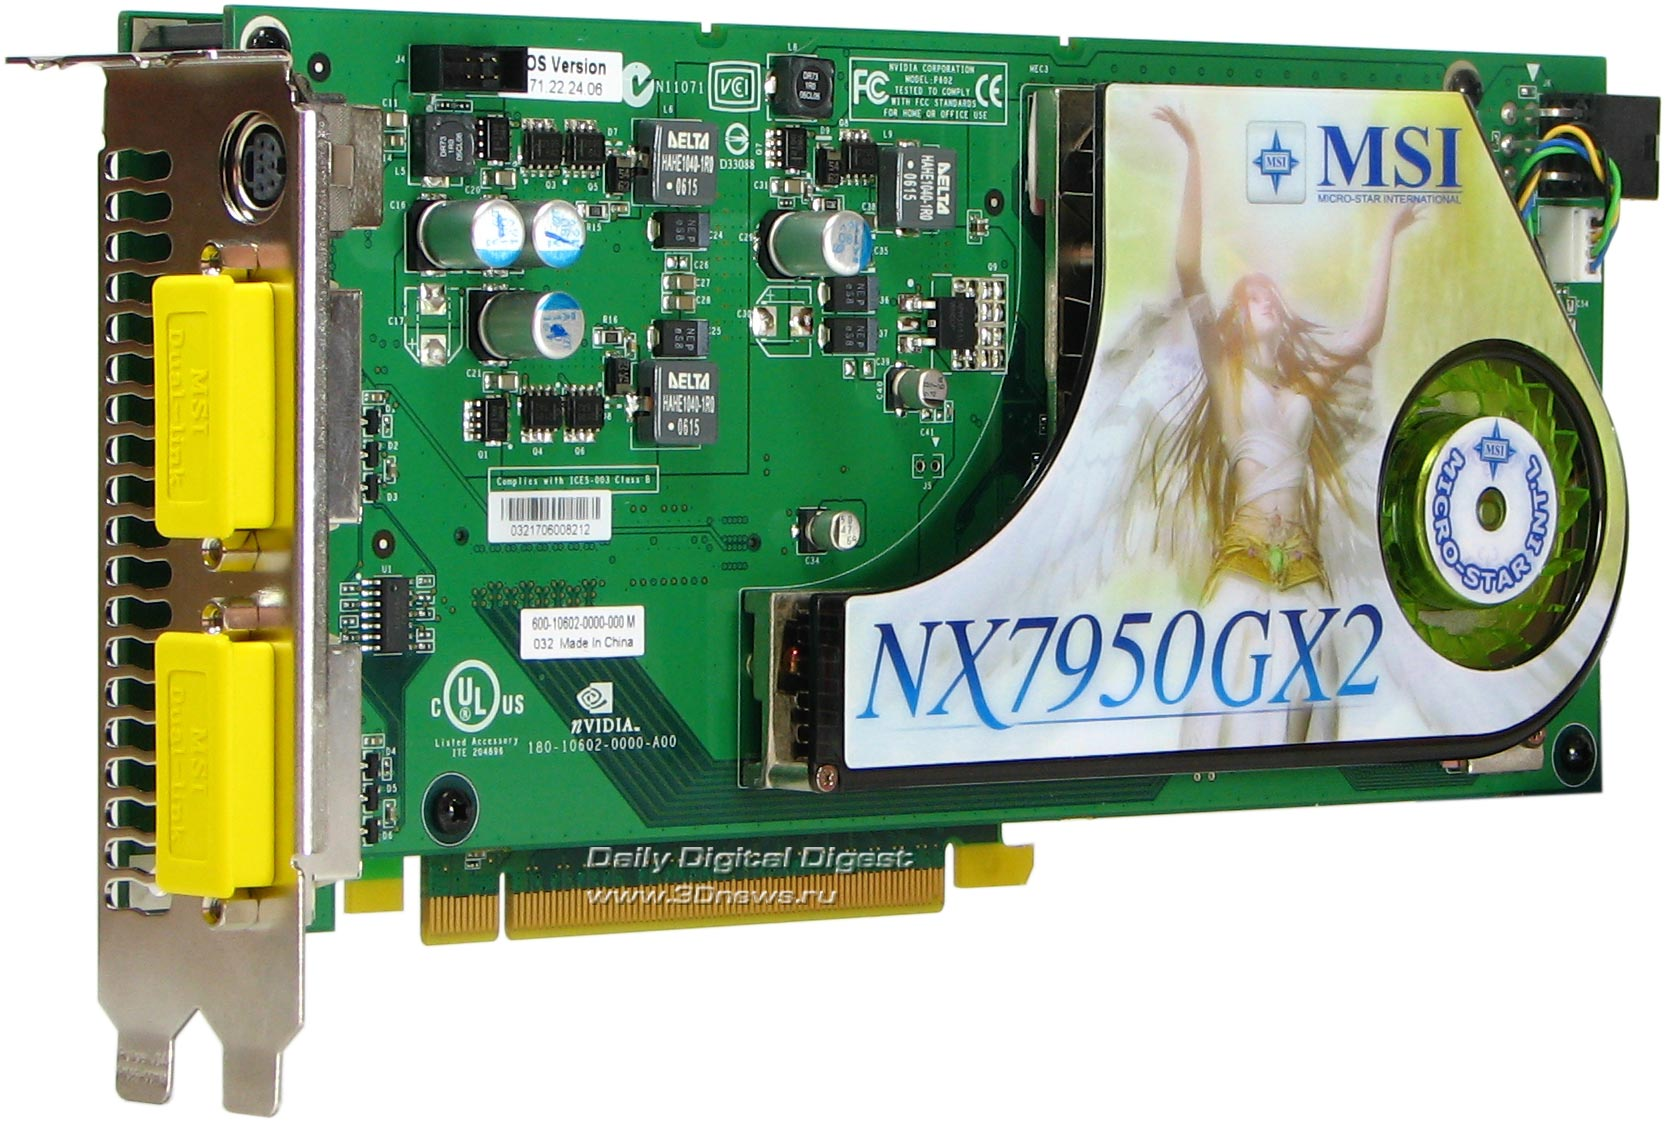 MSI NX7950GX2 TREIBER WINDOWS 10